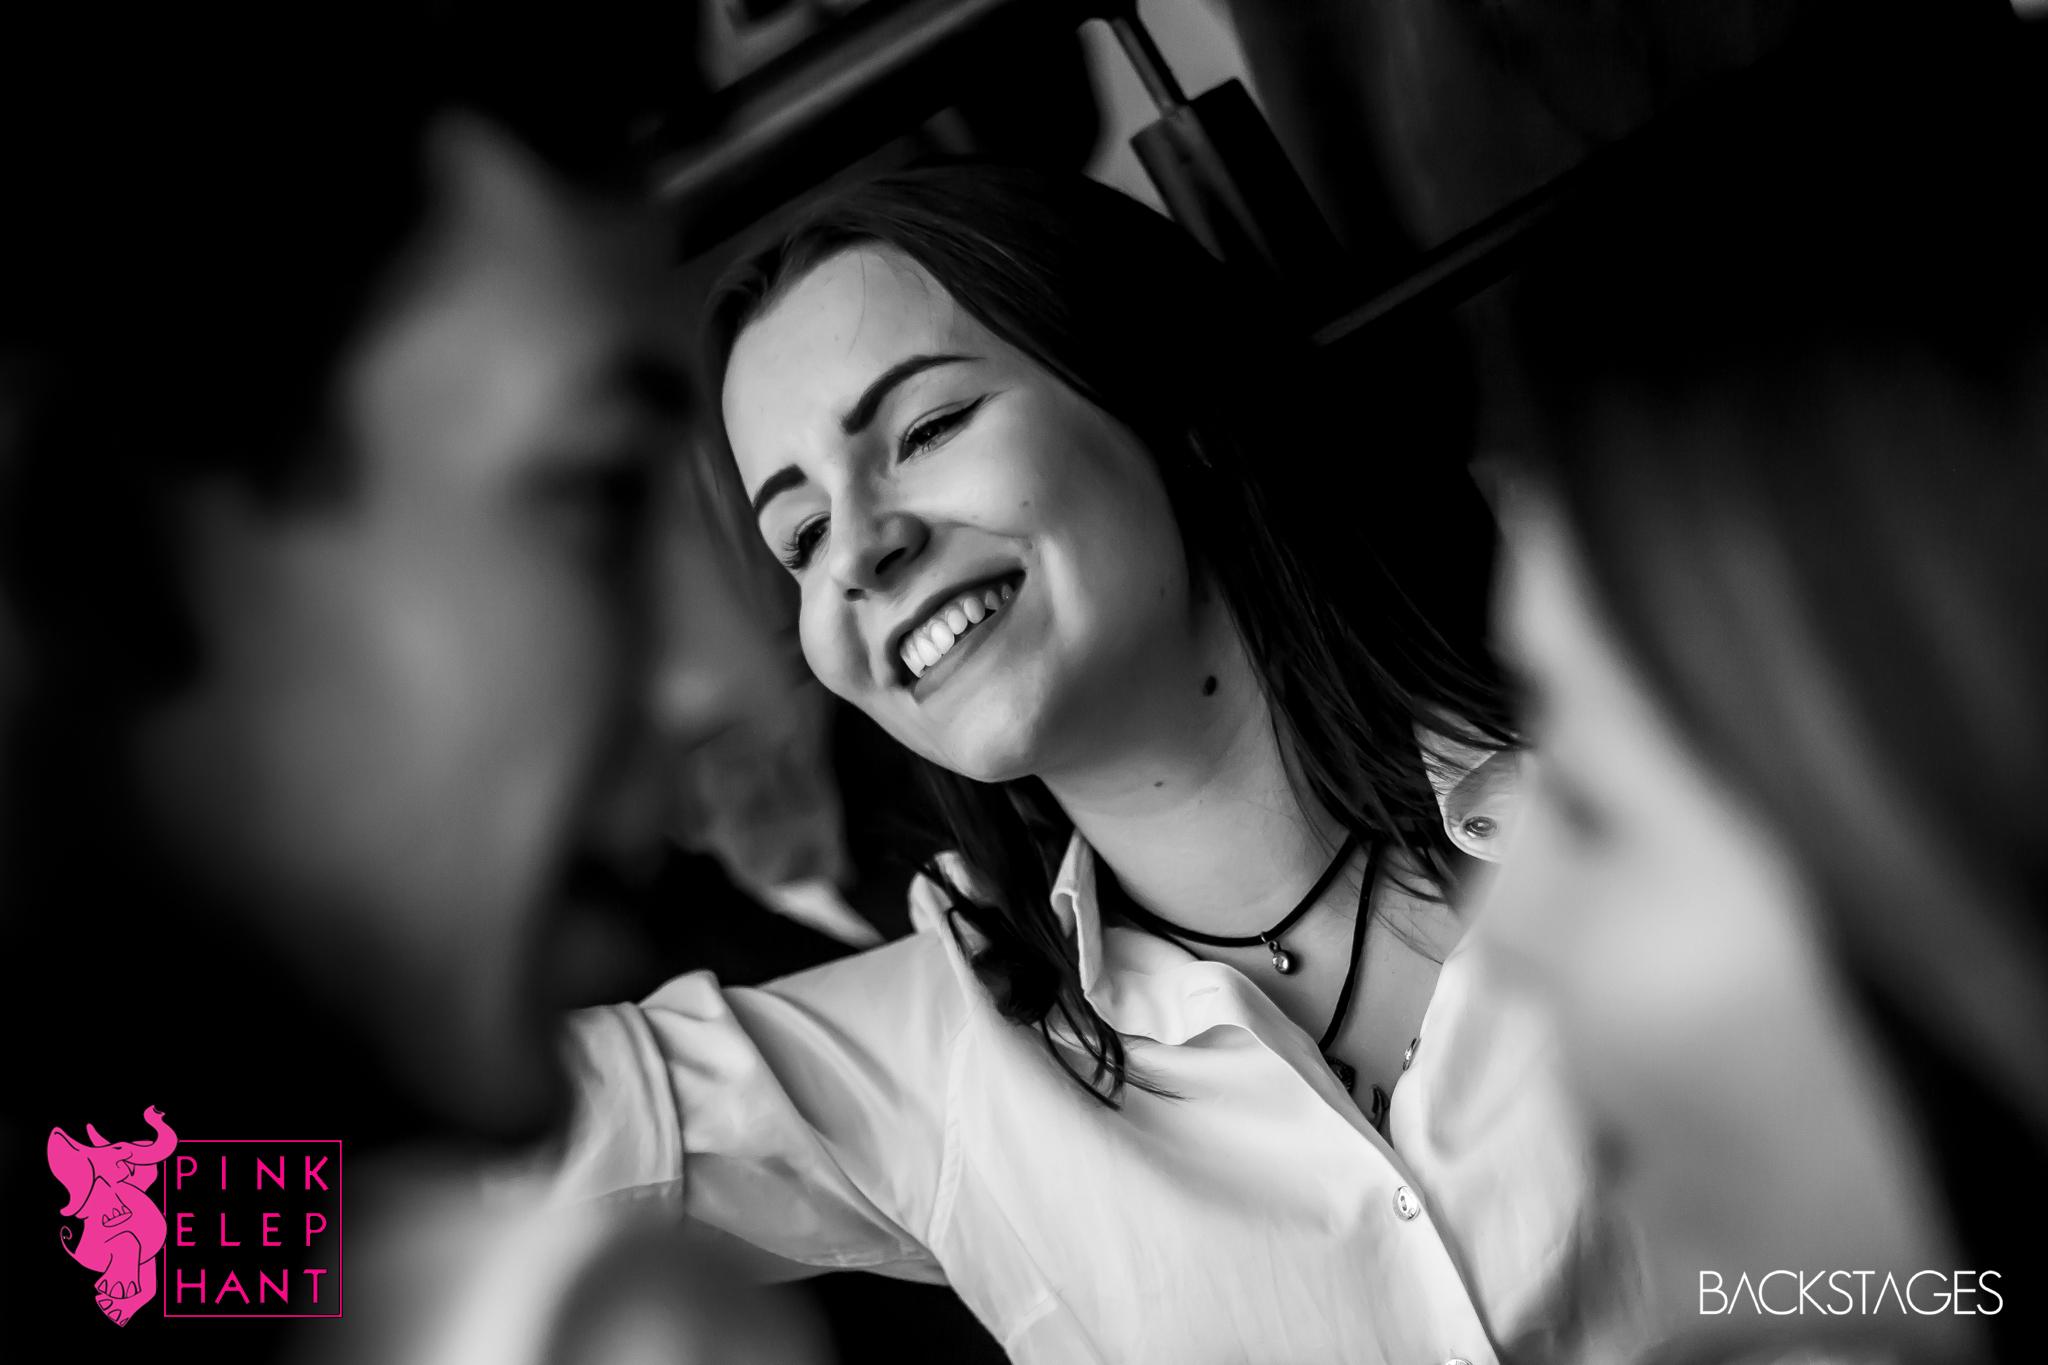 Pink-elephant-club-sorocaba-revista-backstages-foto-kenzi-marinho (24)